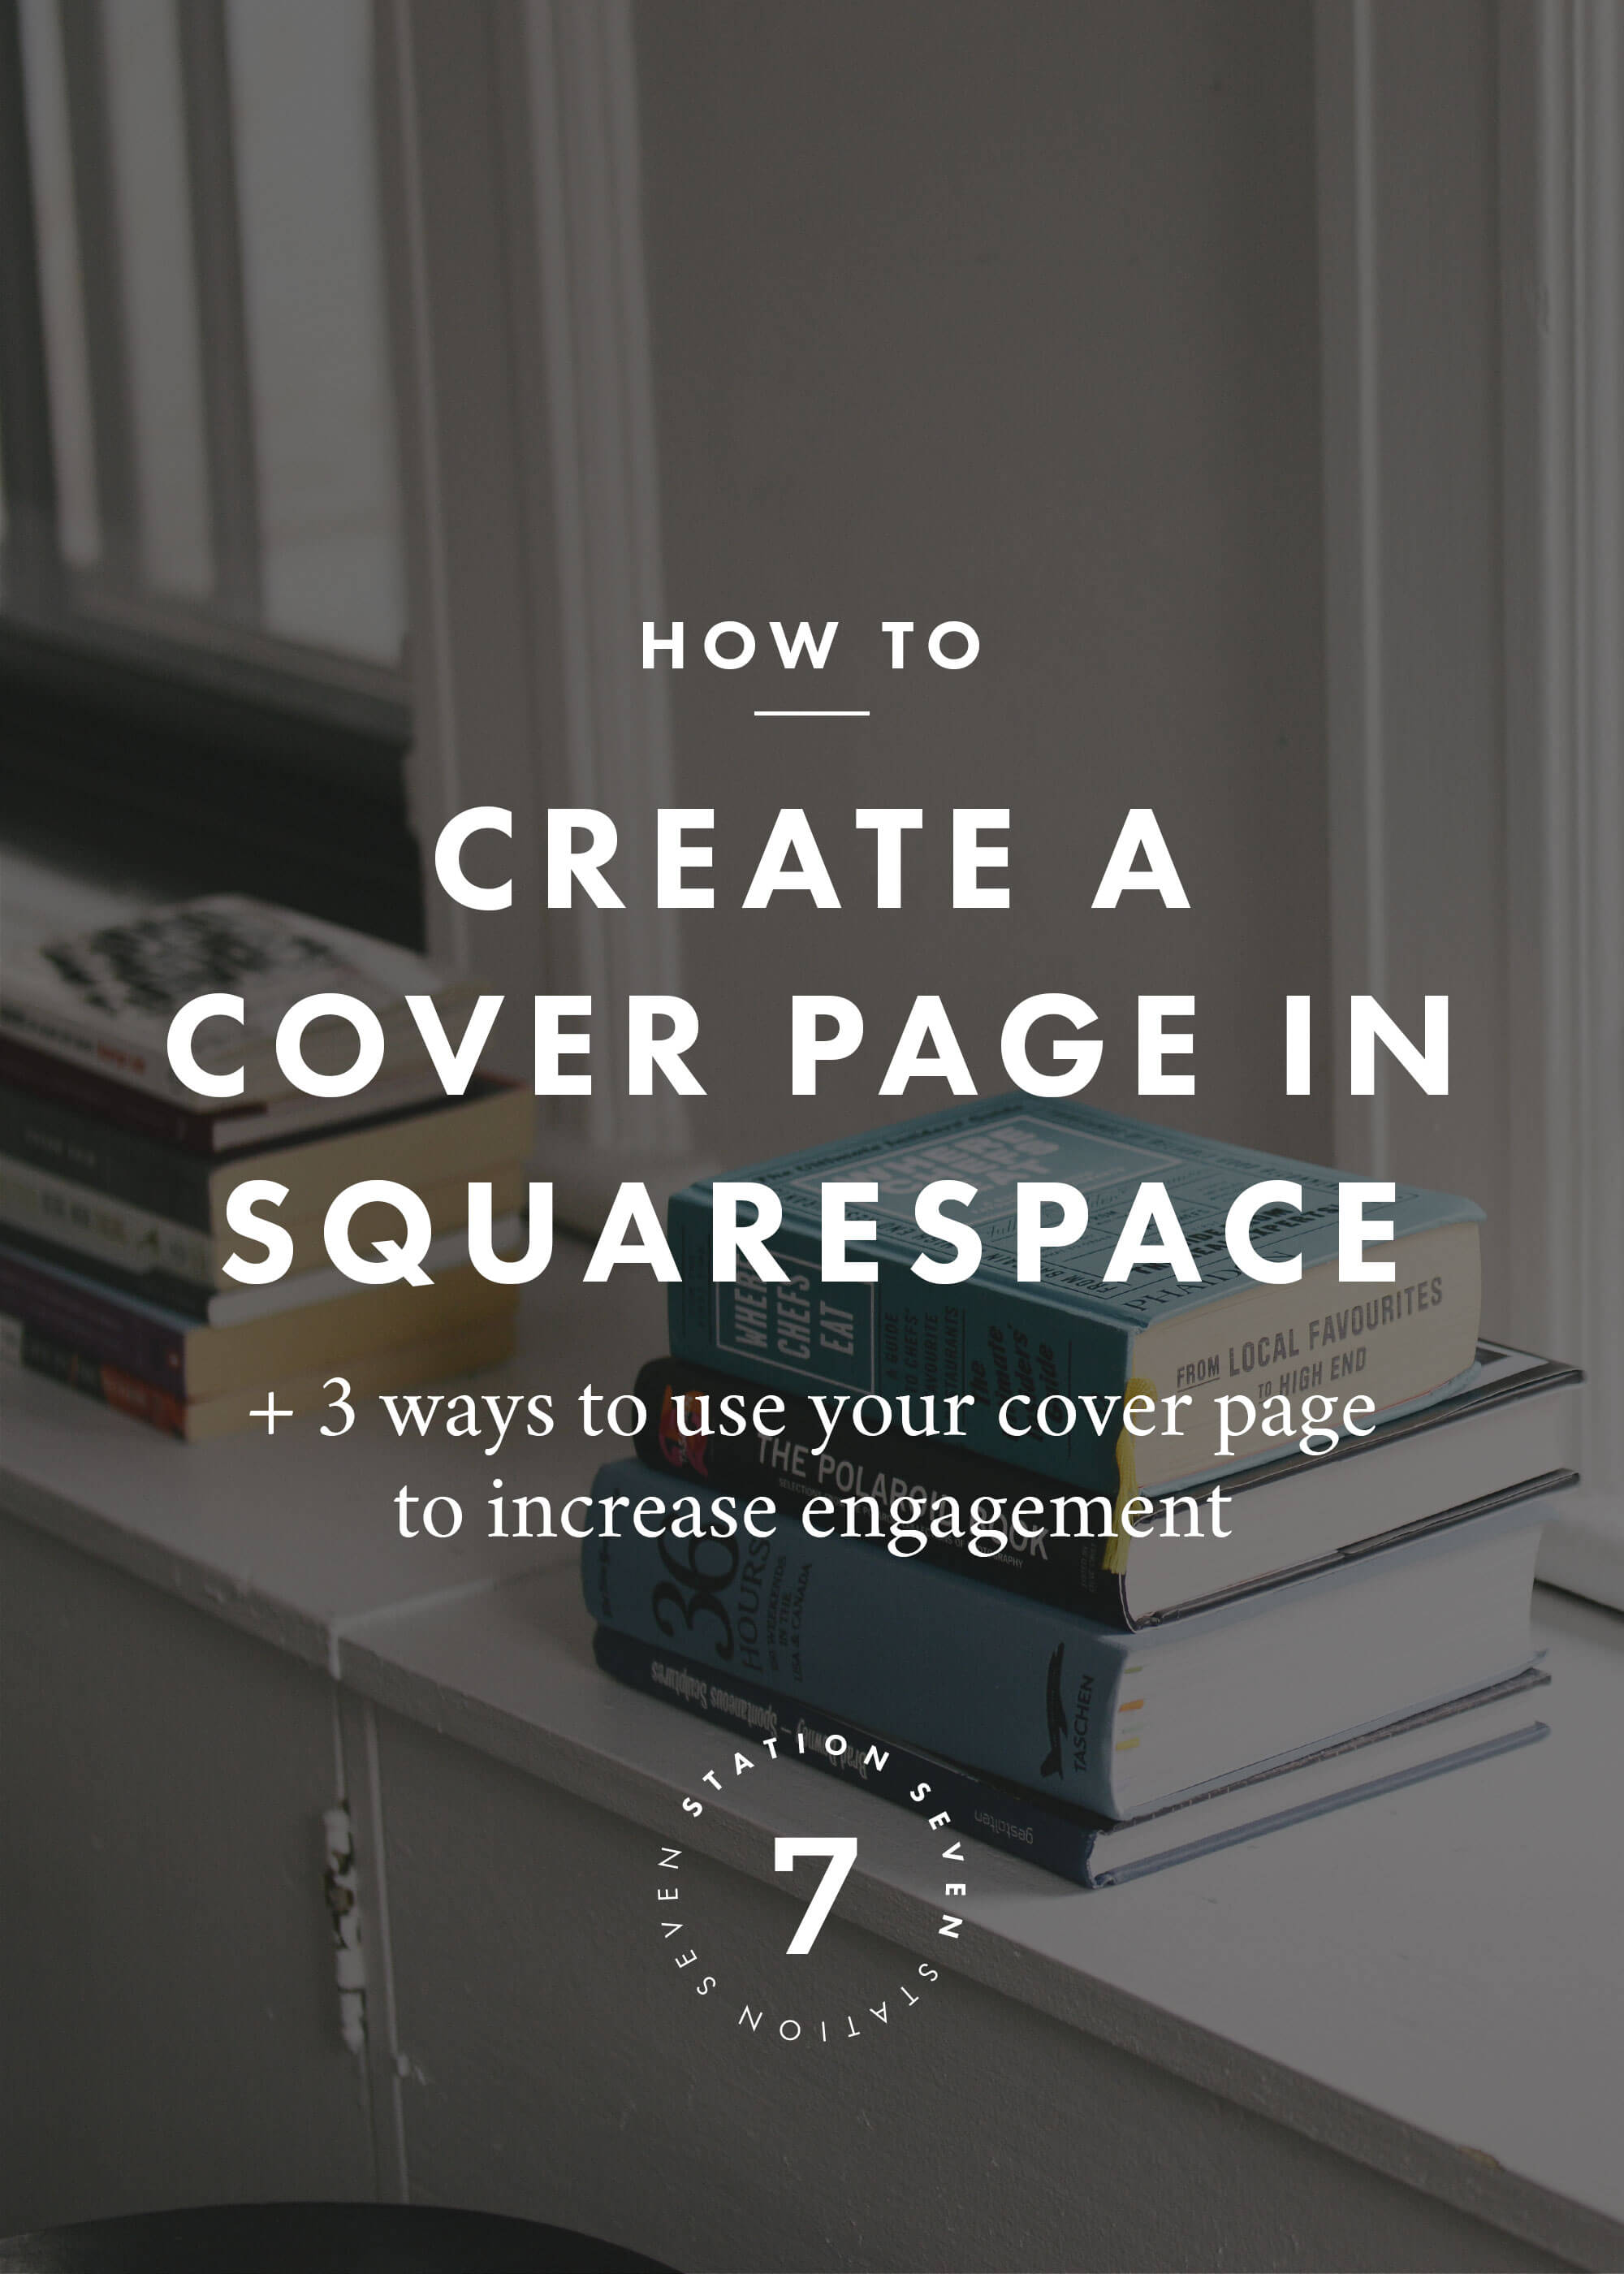 coversquarespace (1).jpg